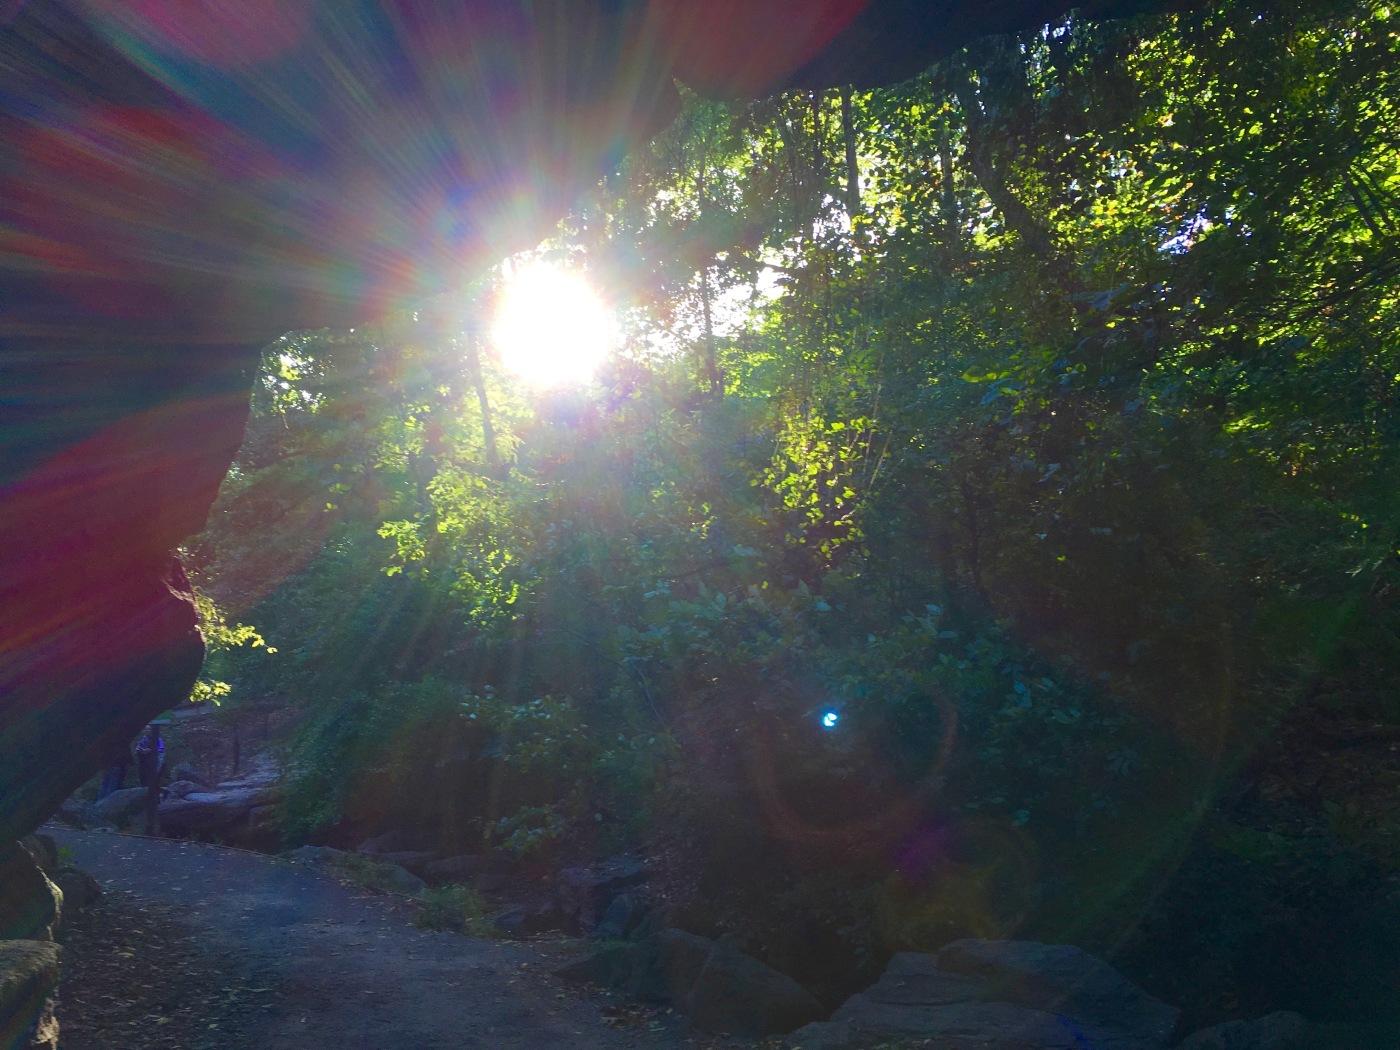 Day 277:4 sunburst